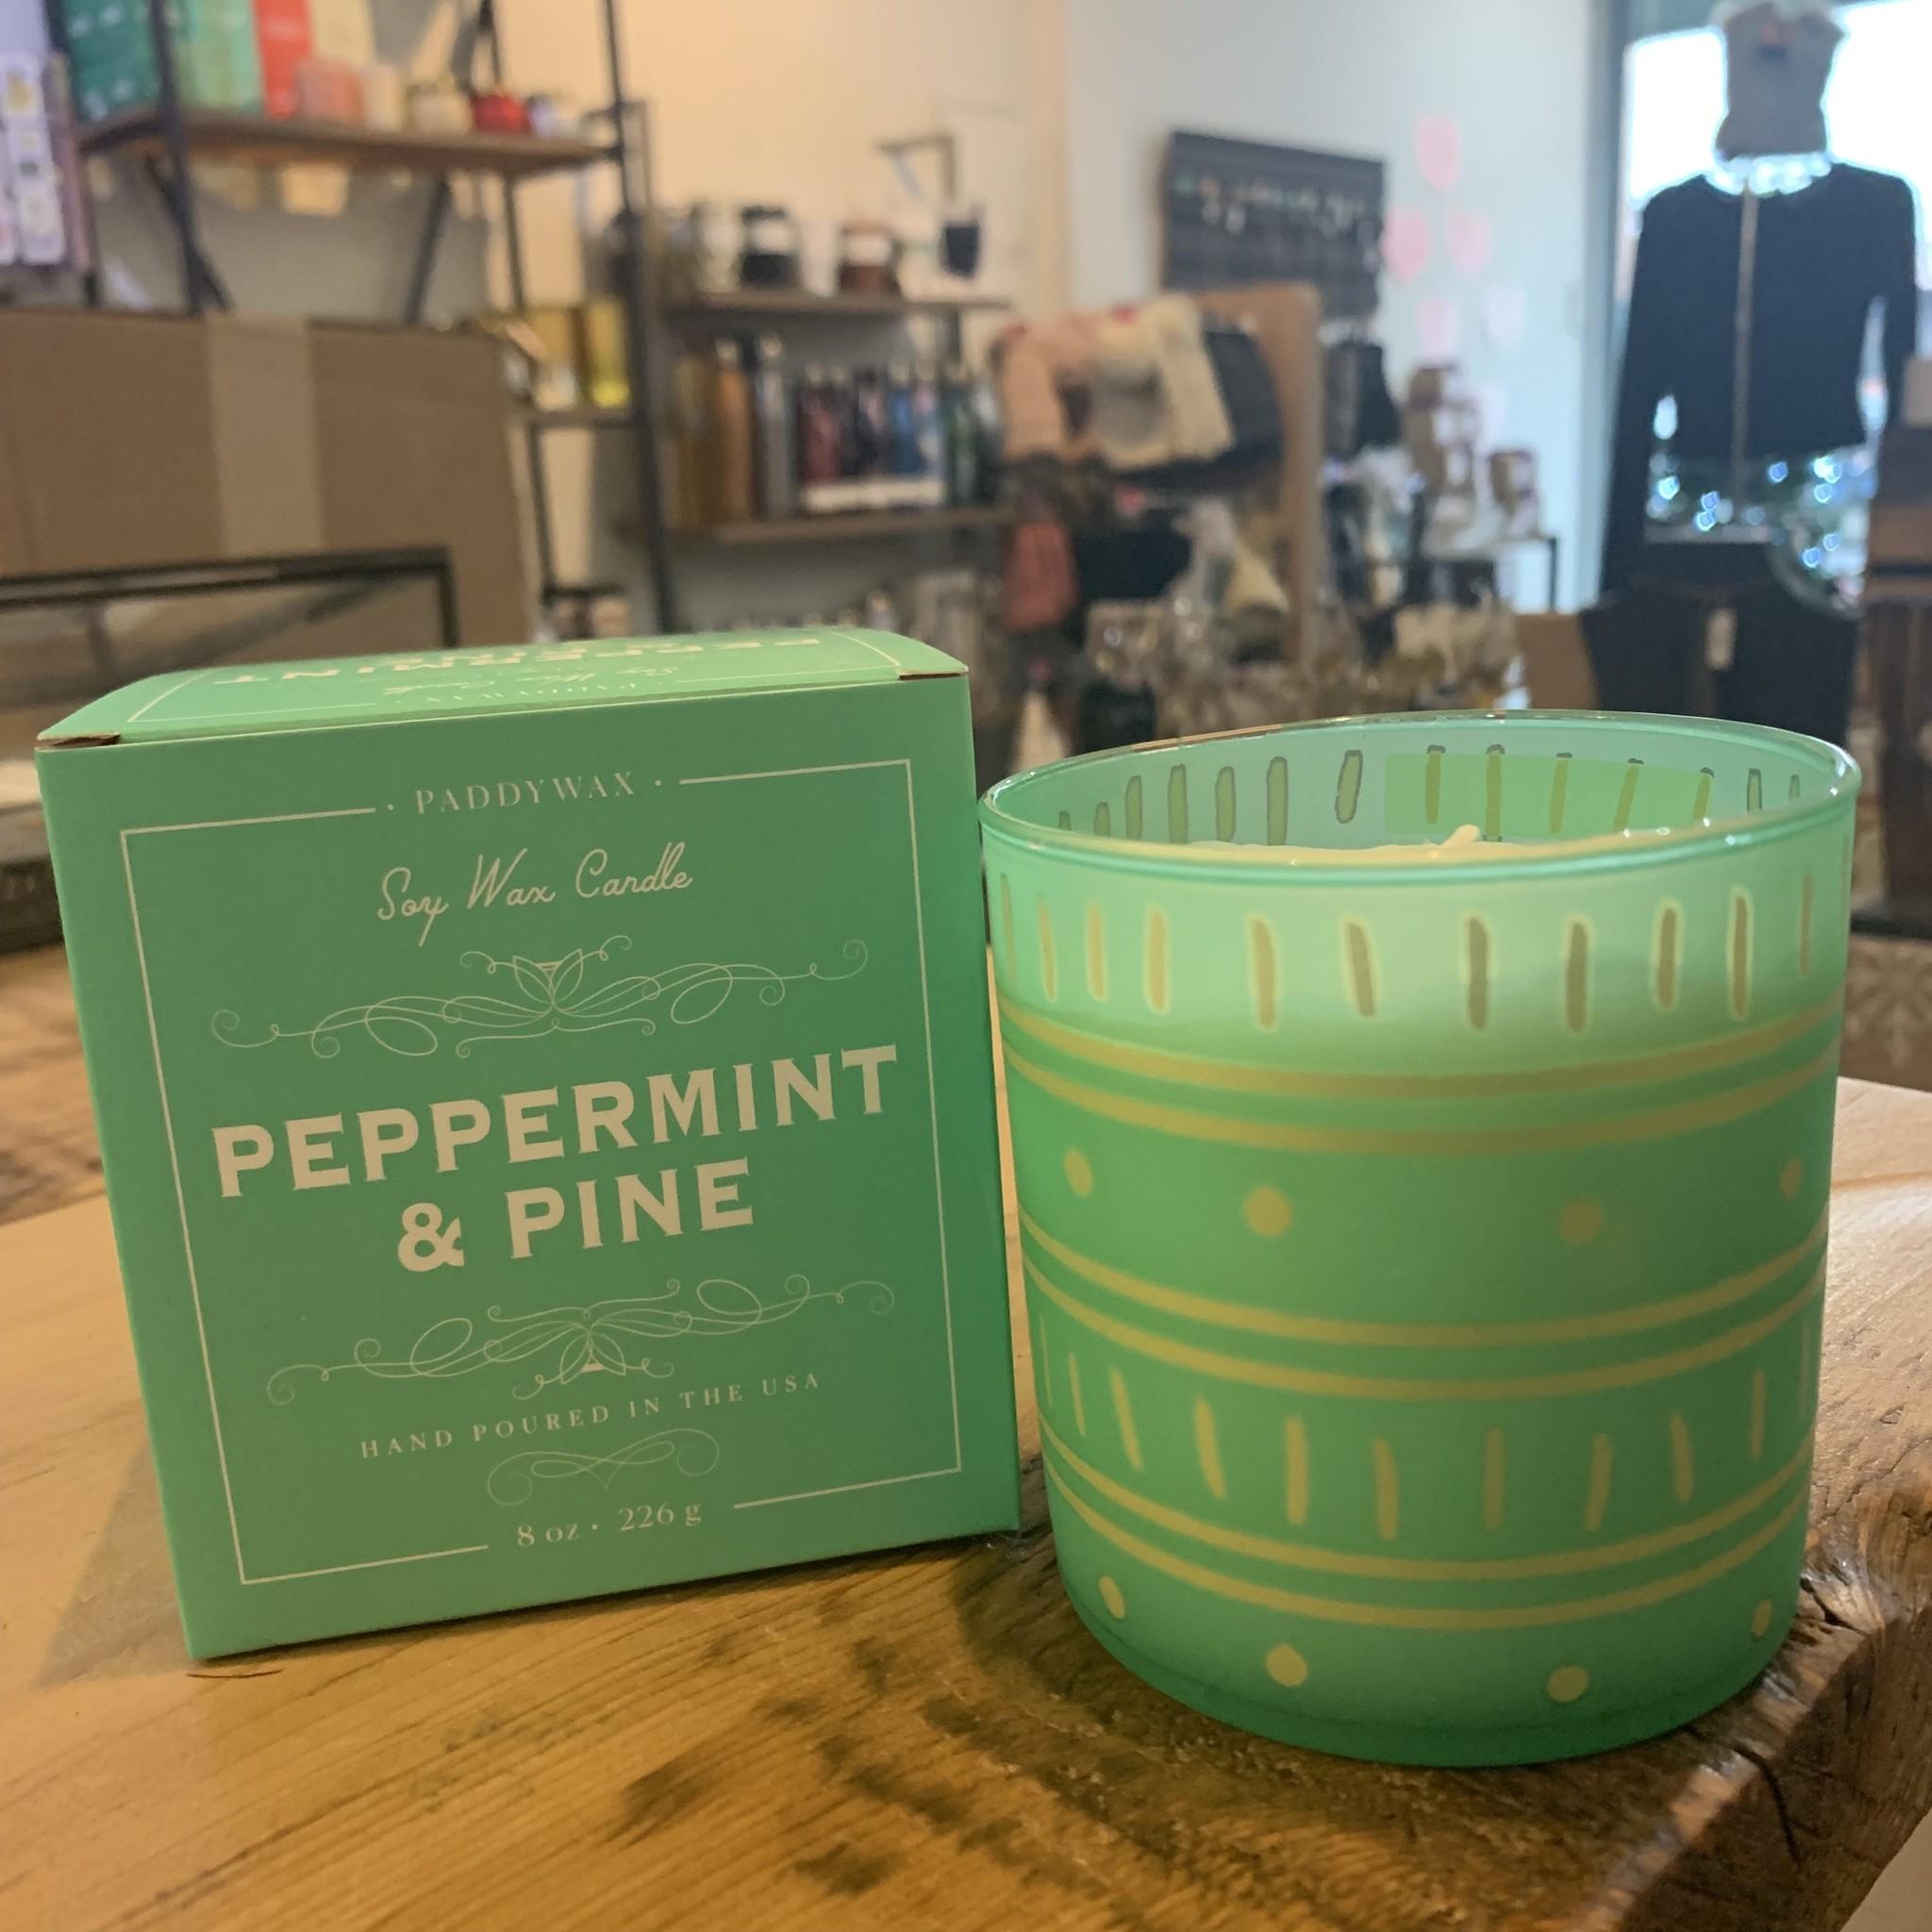 PADDYWAX Glee 8oz Peppermint & Pine